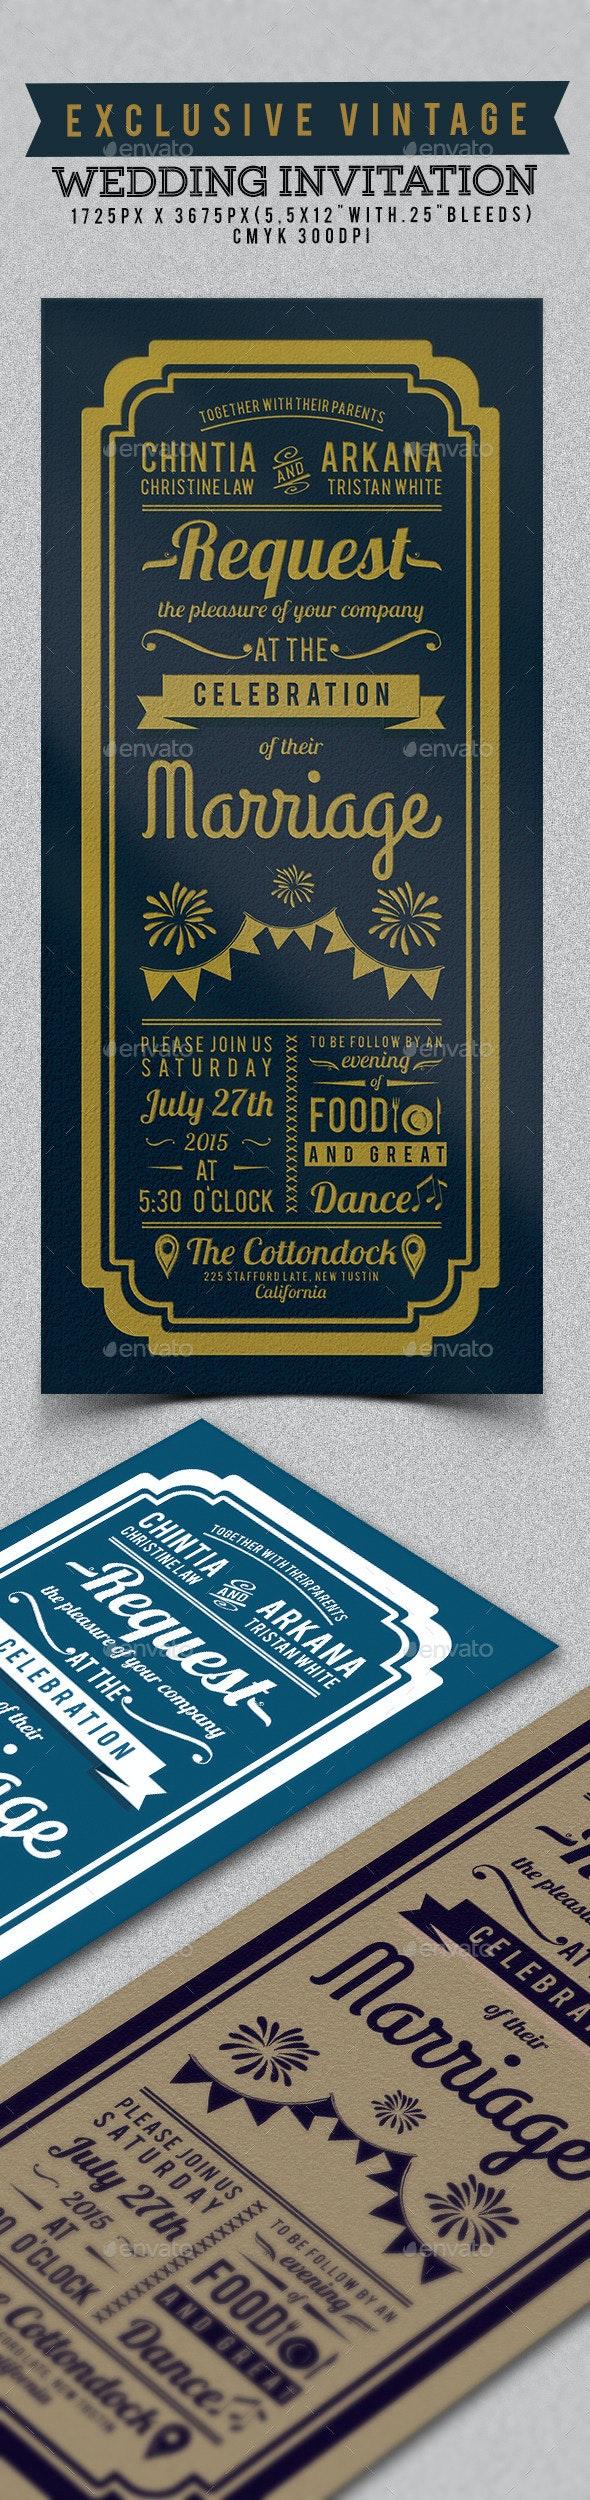 Exclusive Vintage Wedding Invitation - Weddings Cards & Invites